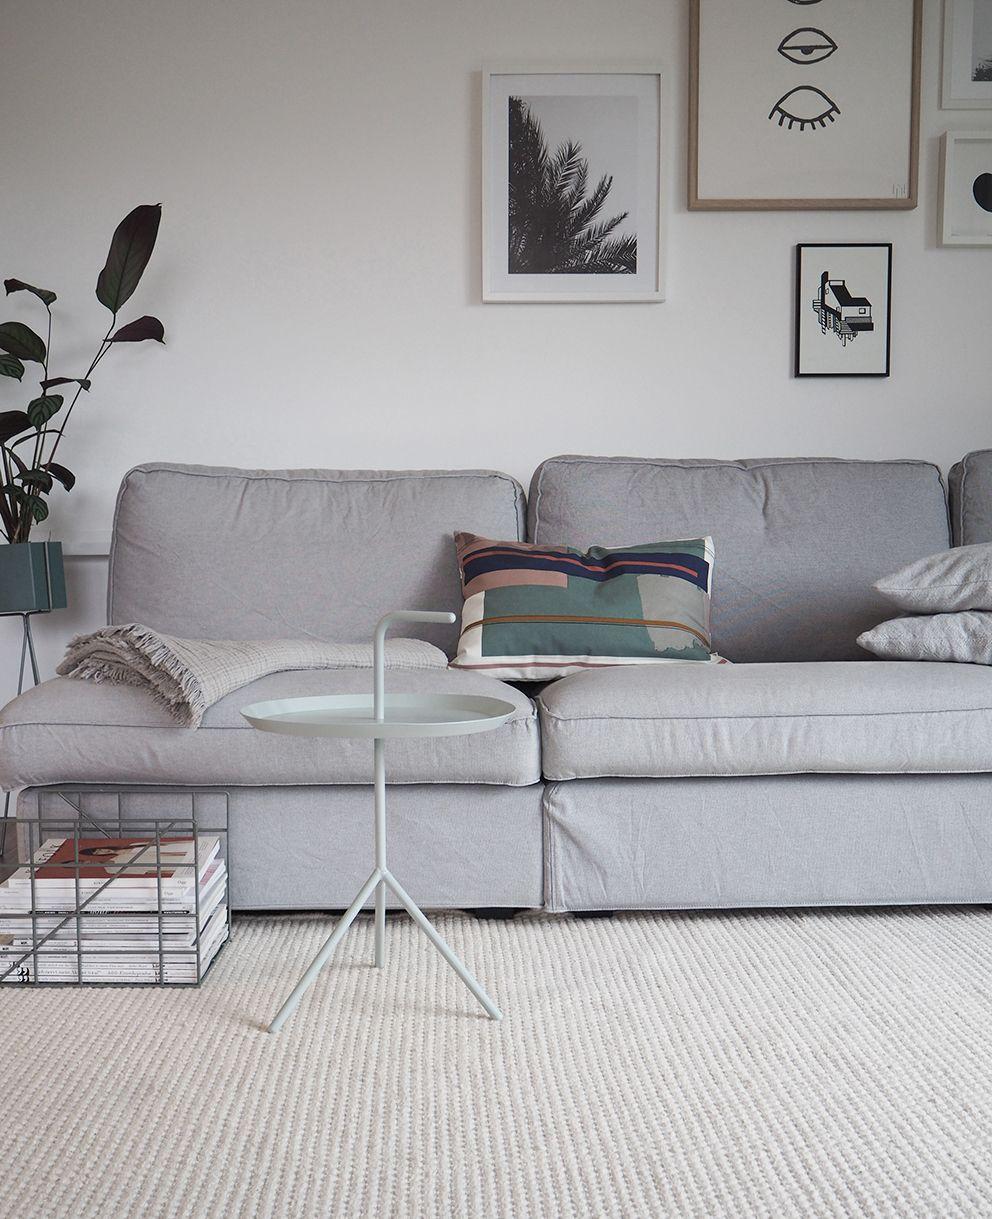 kissen wandkerzenhalter duftkerze pflanzenst nder decke tablett glasschalen set. Black Bedroom Furniture Sets. Home Design Ideas